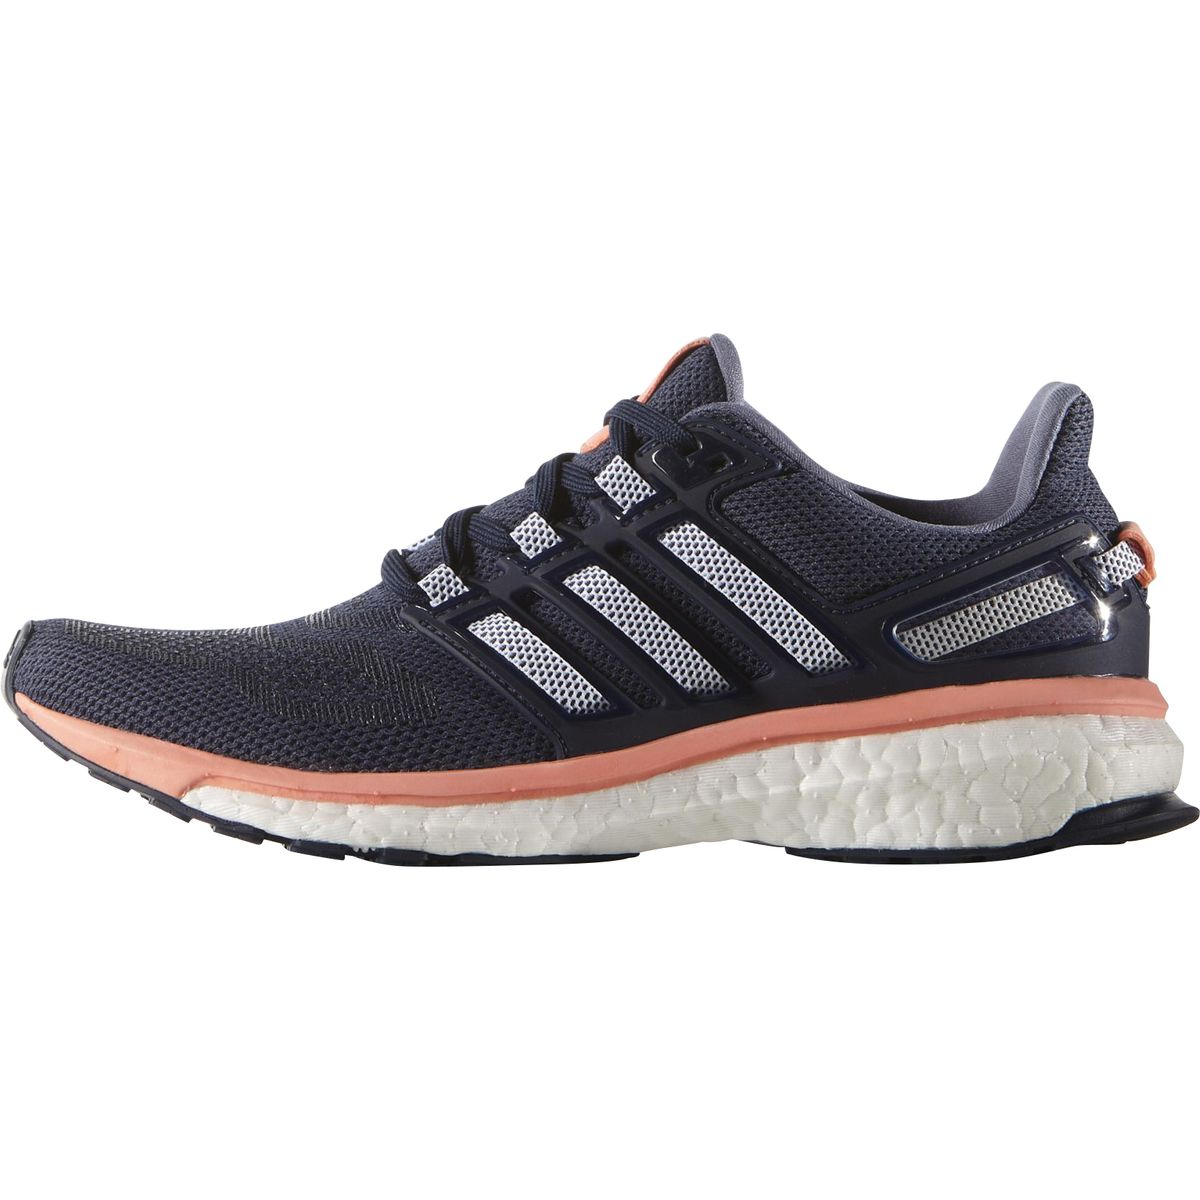 adidas energy boost 3 running shoe women 39 s ebay. Black Bedroom Furniture Sets. Home Design Ideas